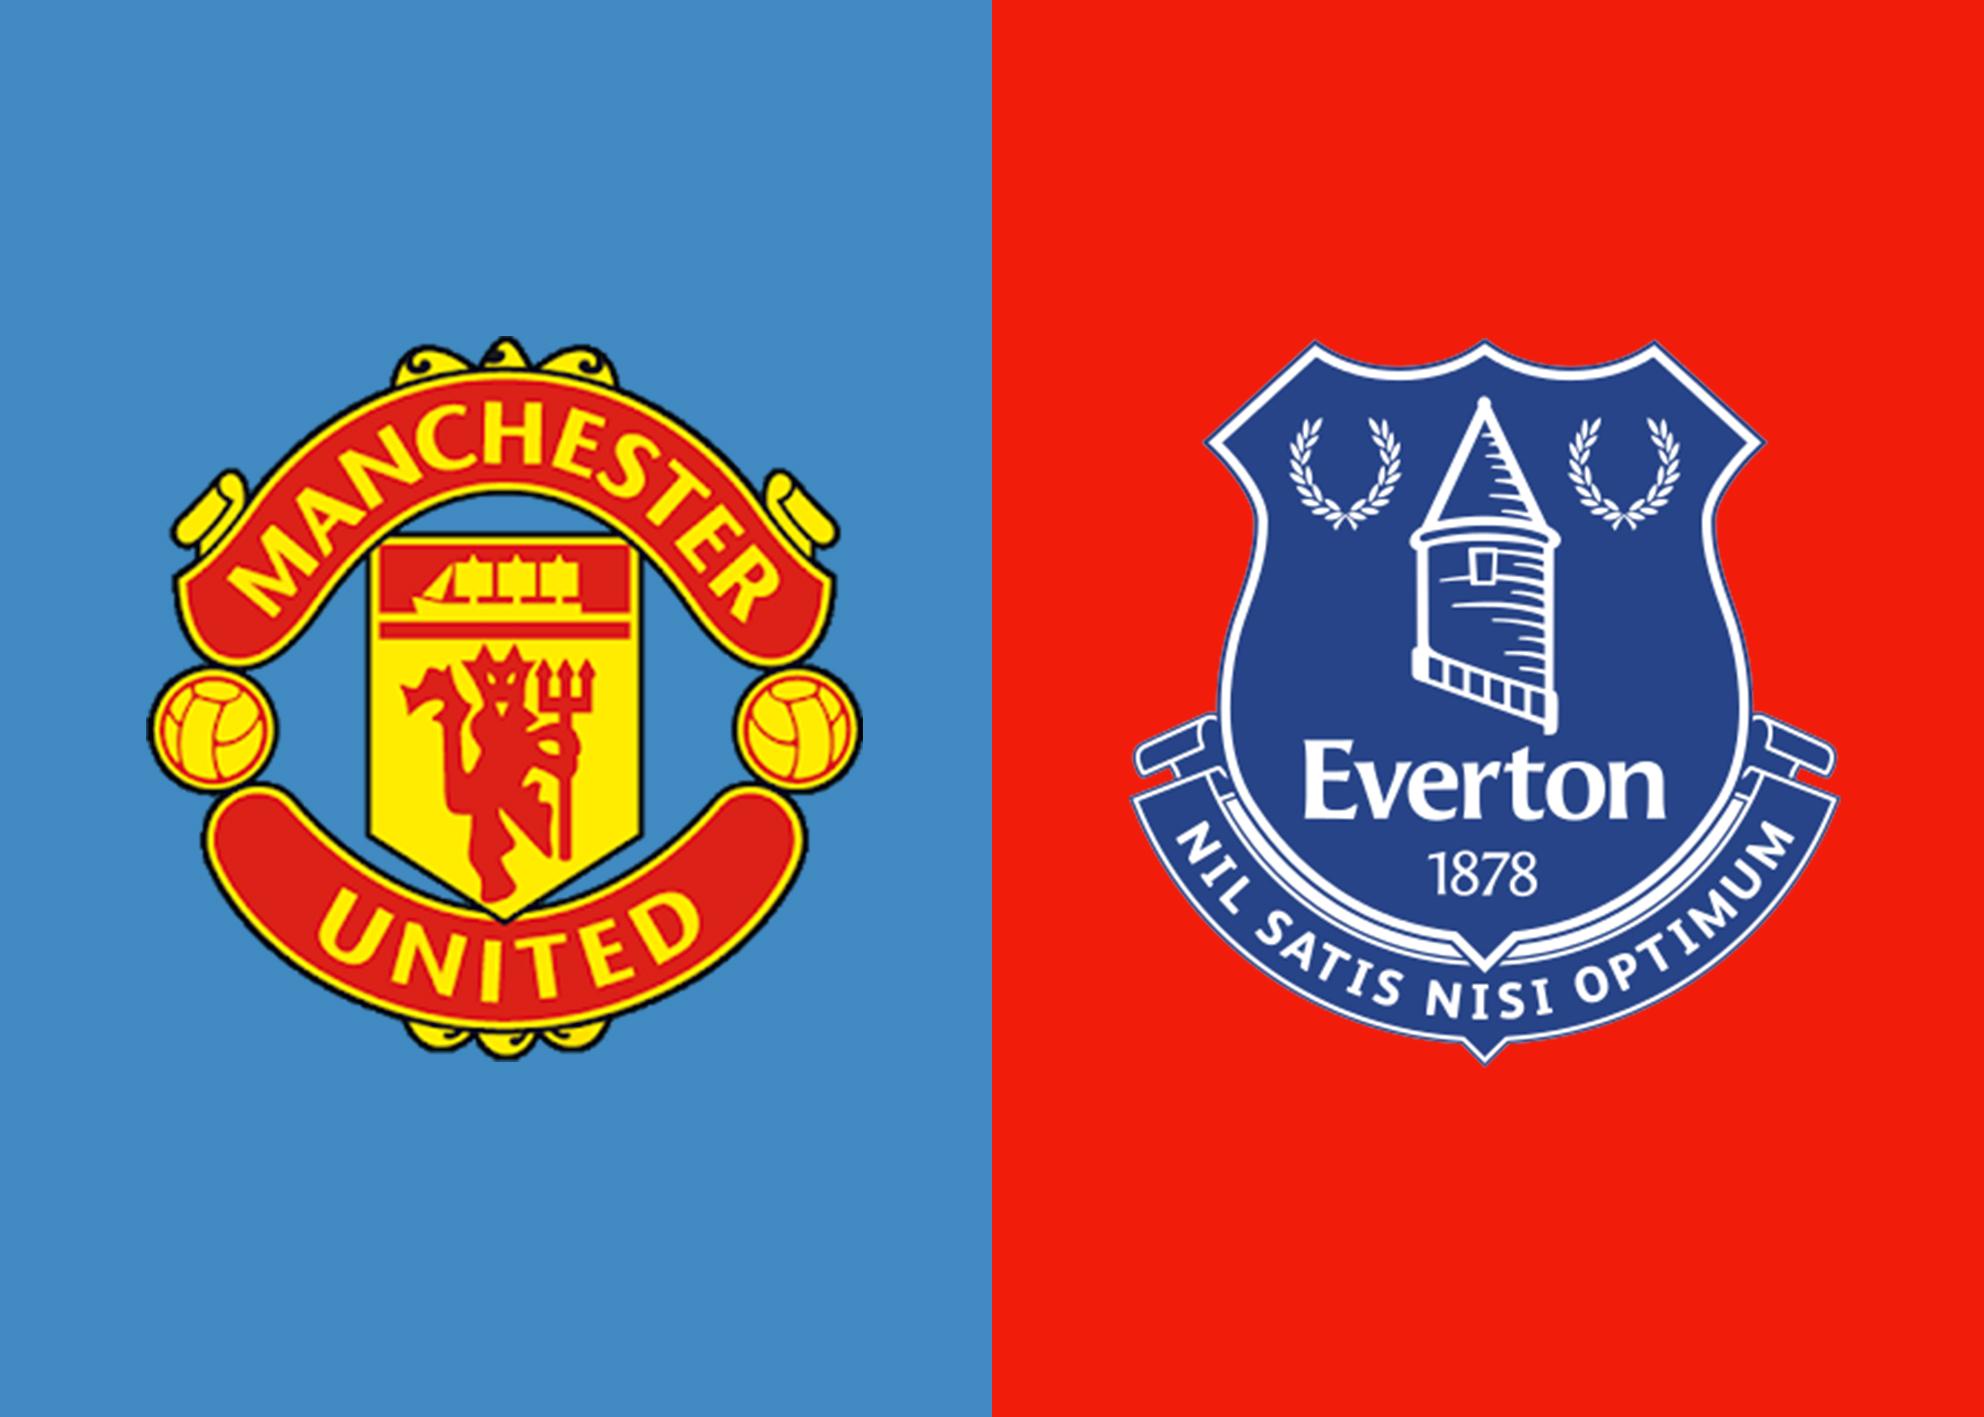 man united vs everton - photo #21